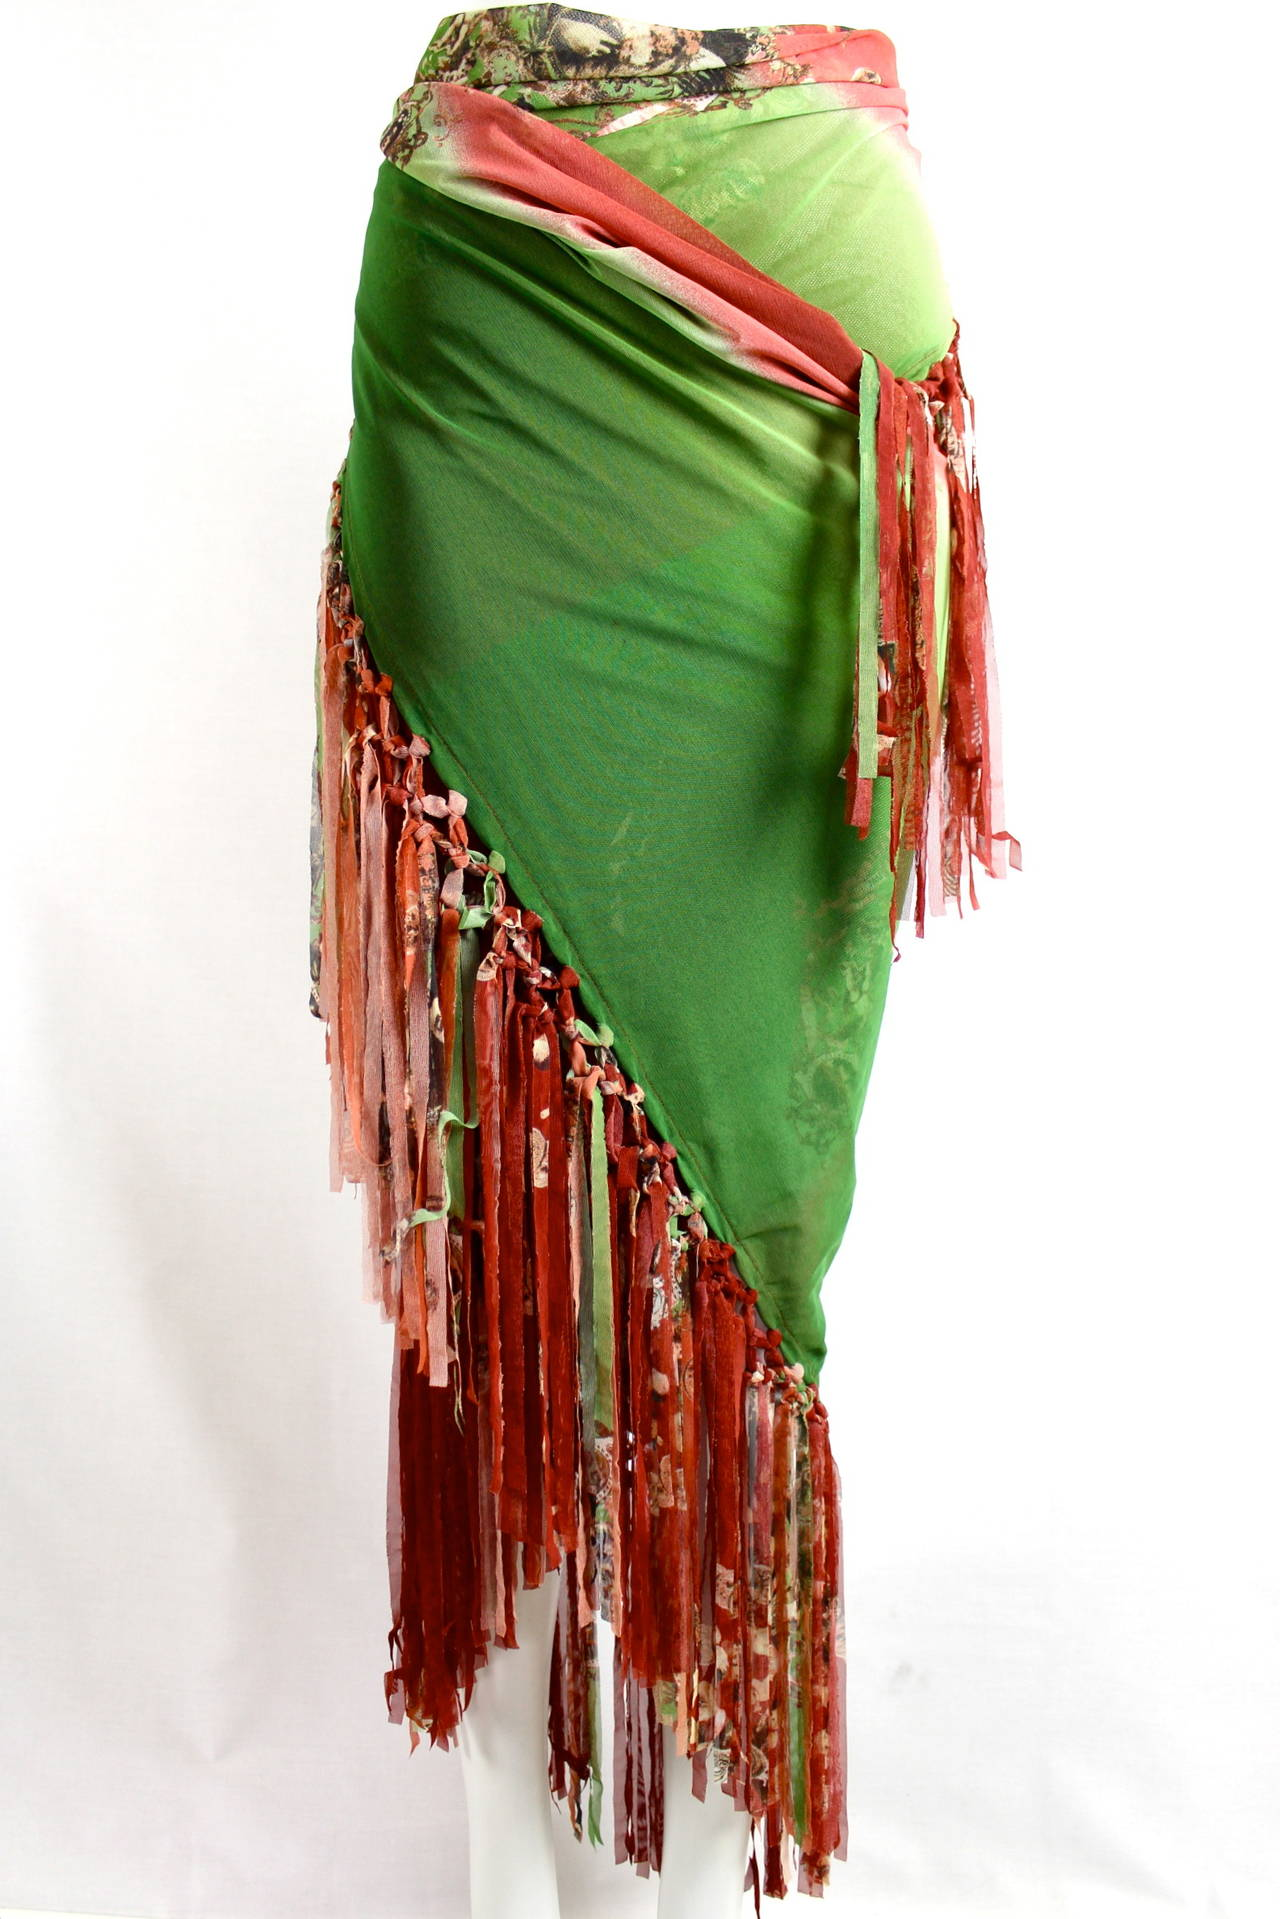 jean paul gaultier femme large fringed shawl 997 8 collection at 1stdibs. Black Bedroom Furniture Sets. Home Design Ideas